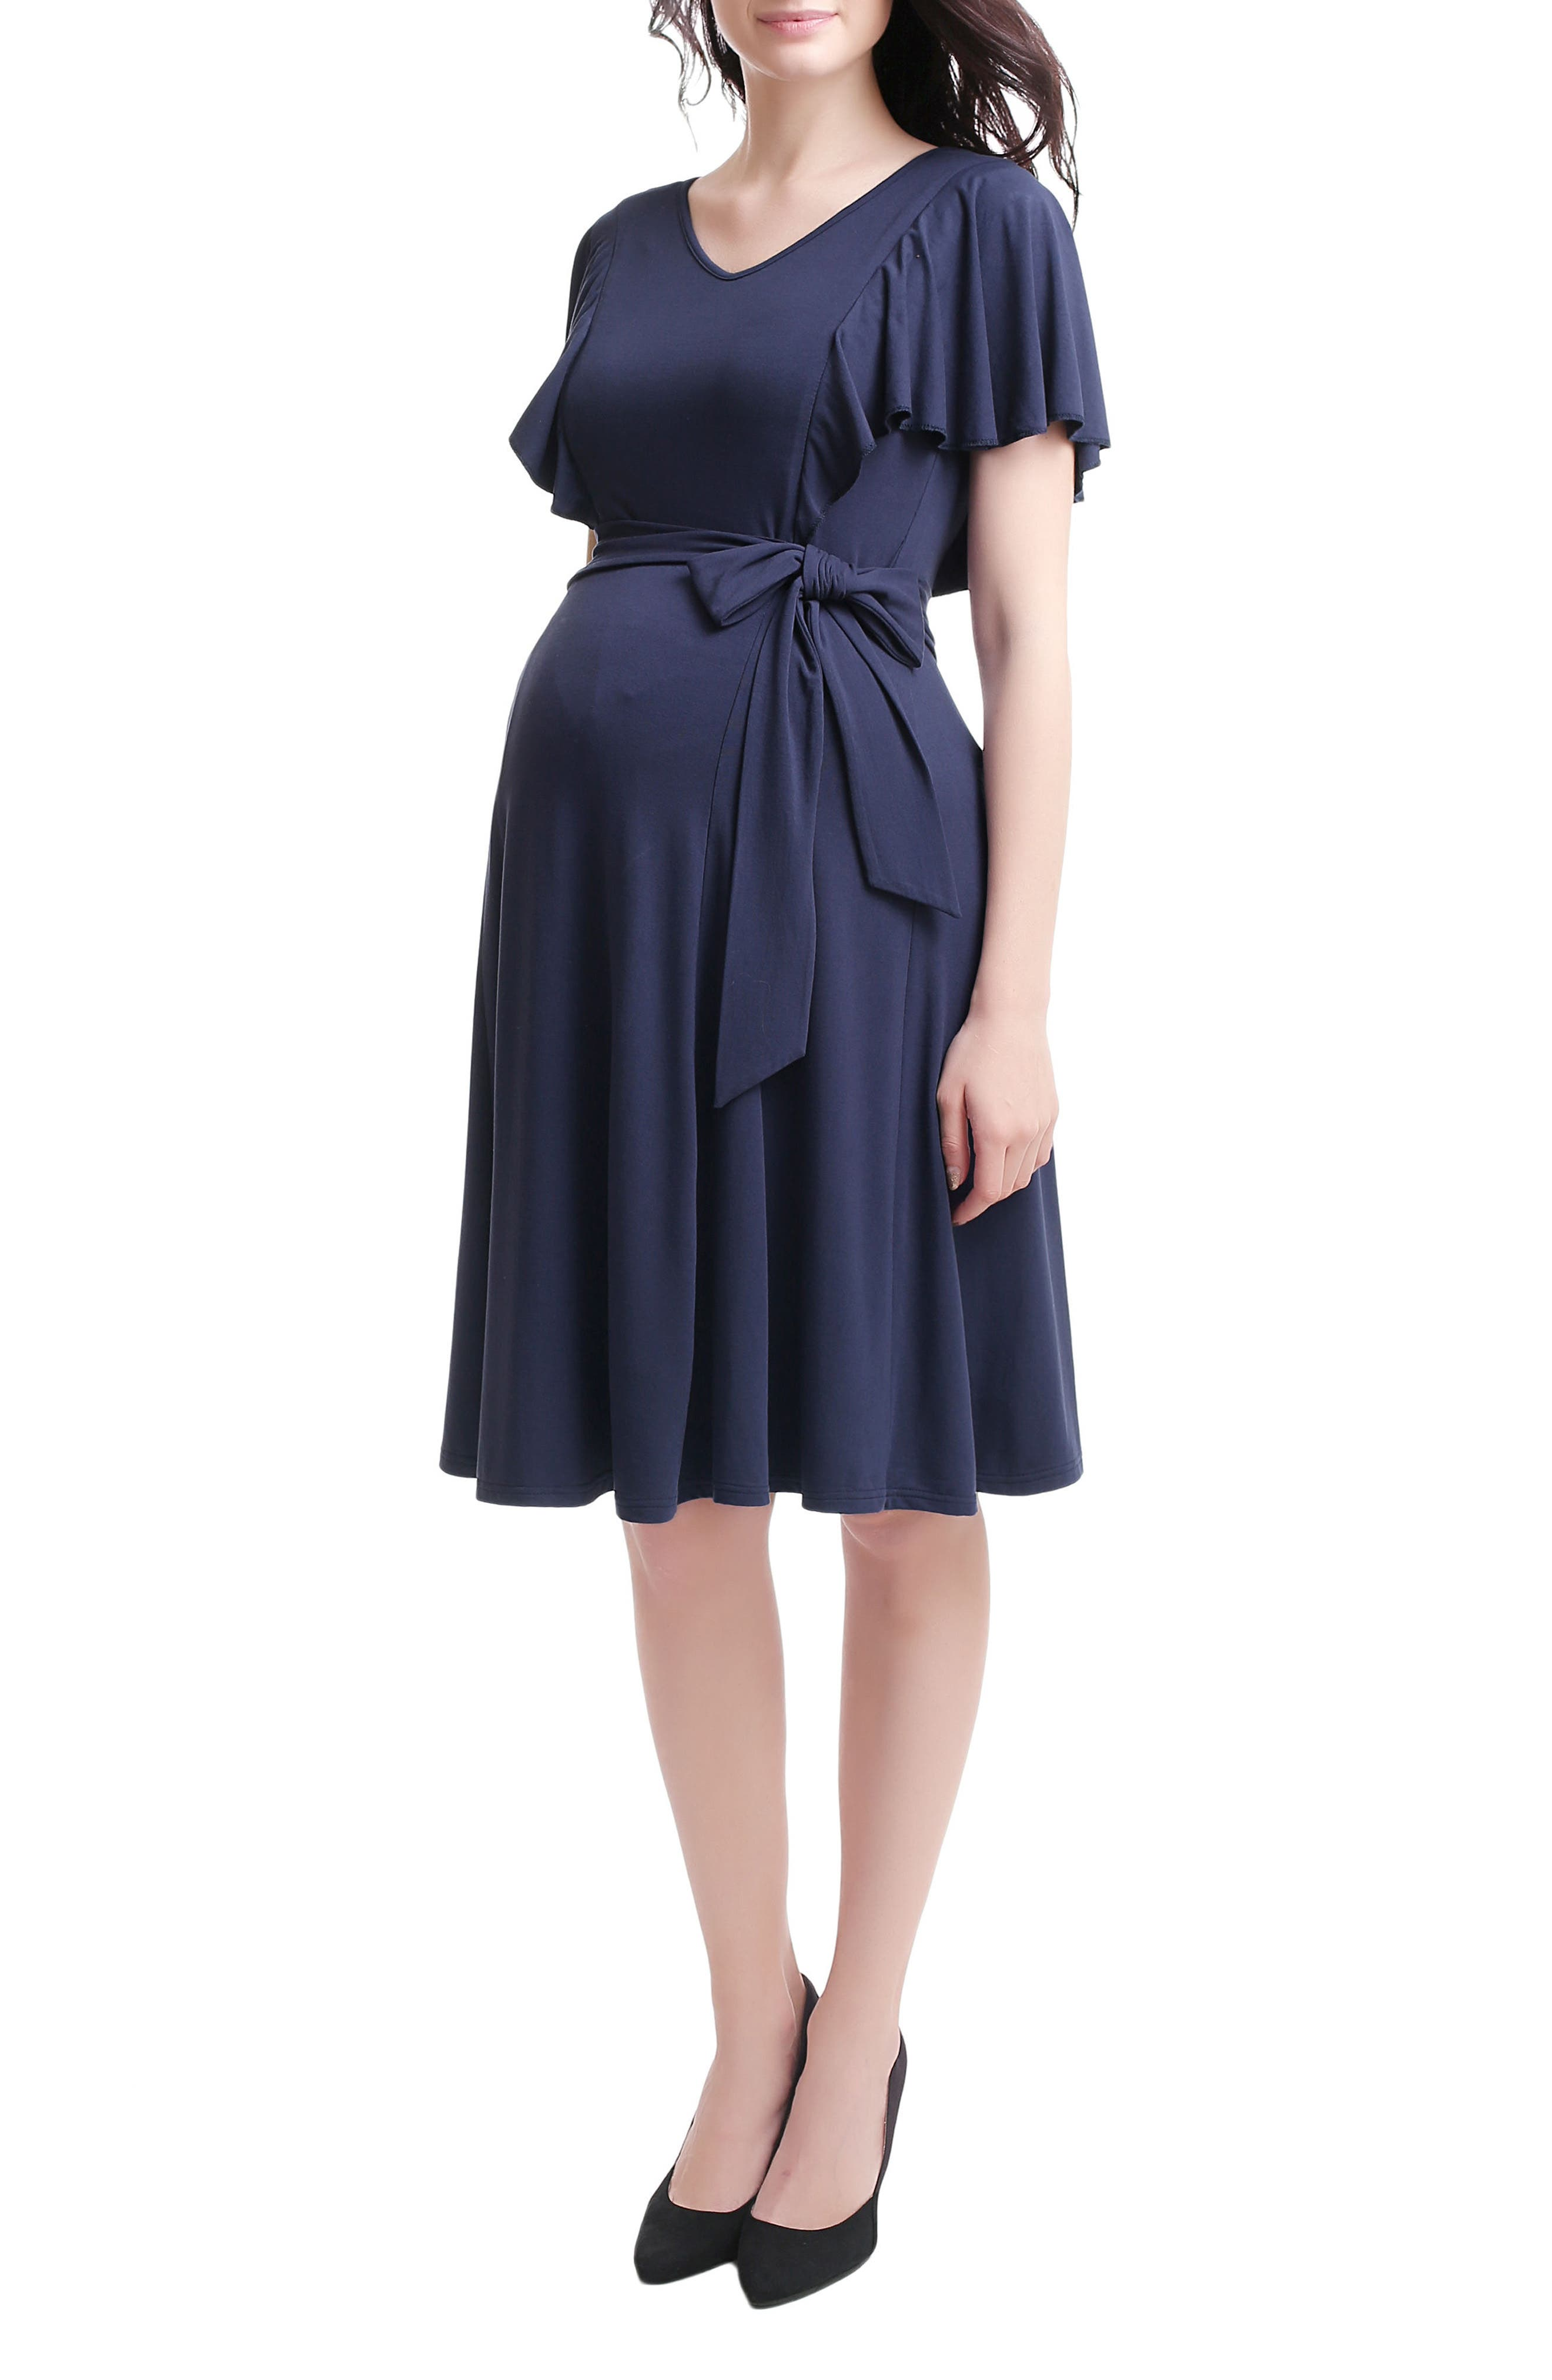 Kimi & Kai Rhea Tie Maternity/Nursing Skater Dress,                             Alternate thumbnail 3, color,                             NAVY